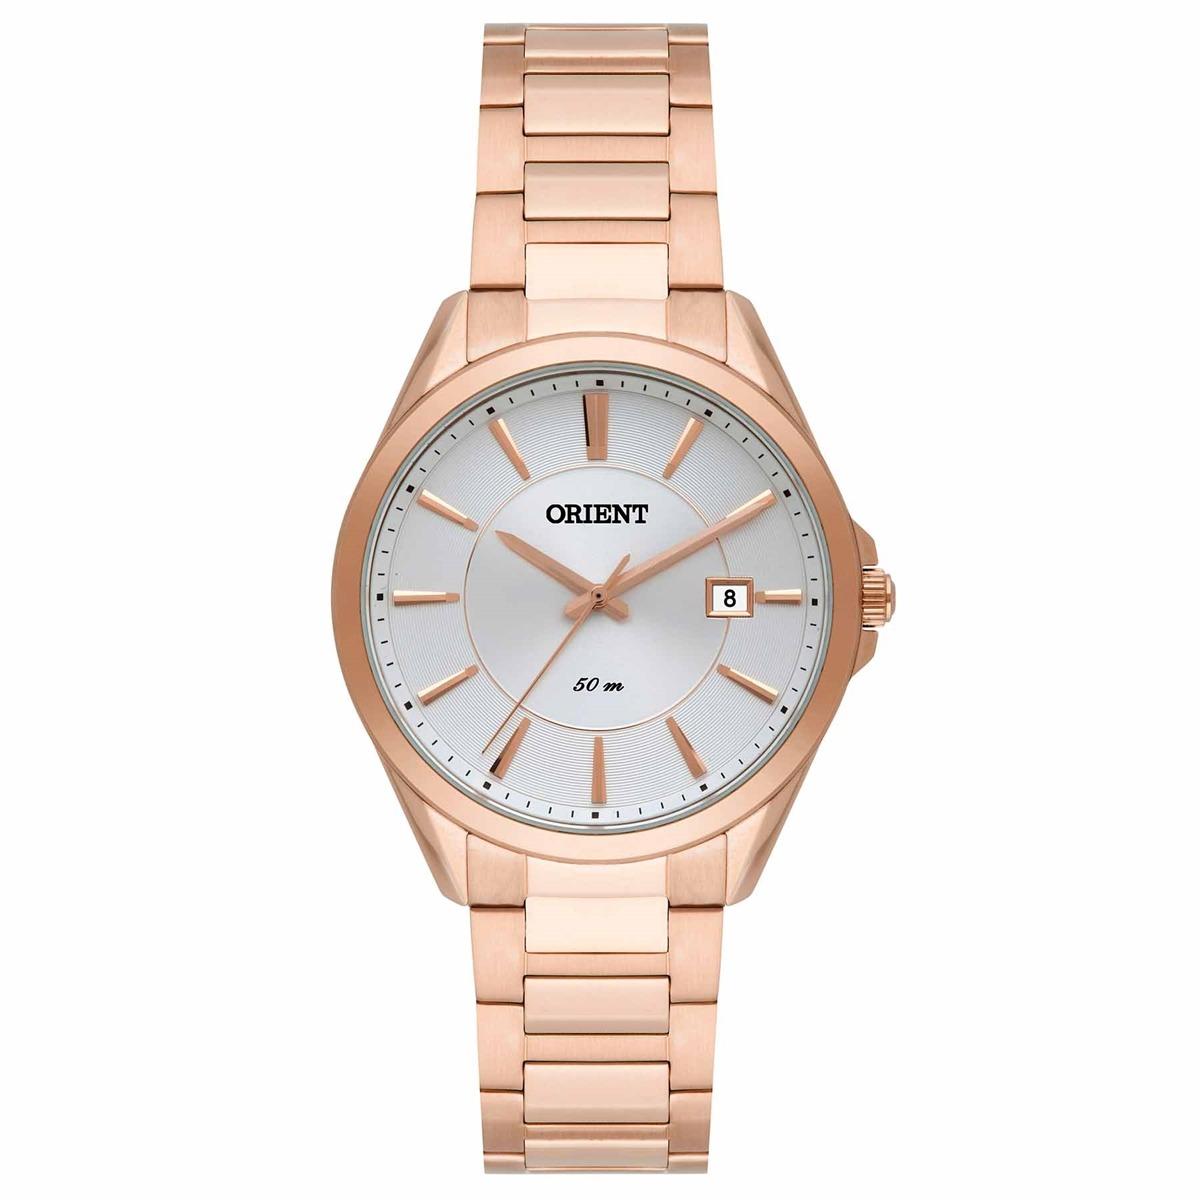 Relógio Orient Analógico Feminino Rose Frss1028 S1rx - R  399,00 em ... 3b3a1123c9